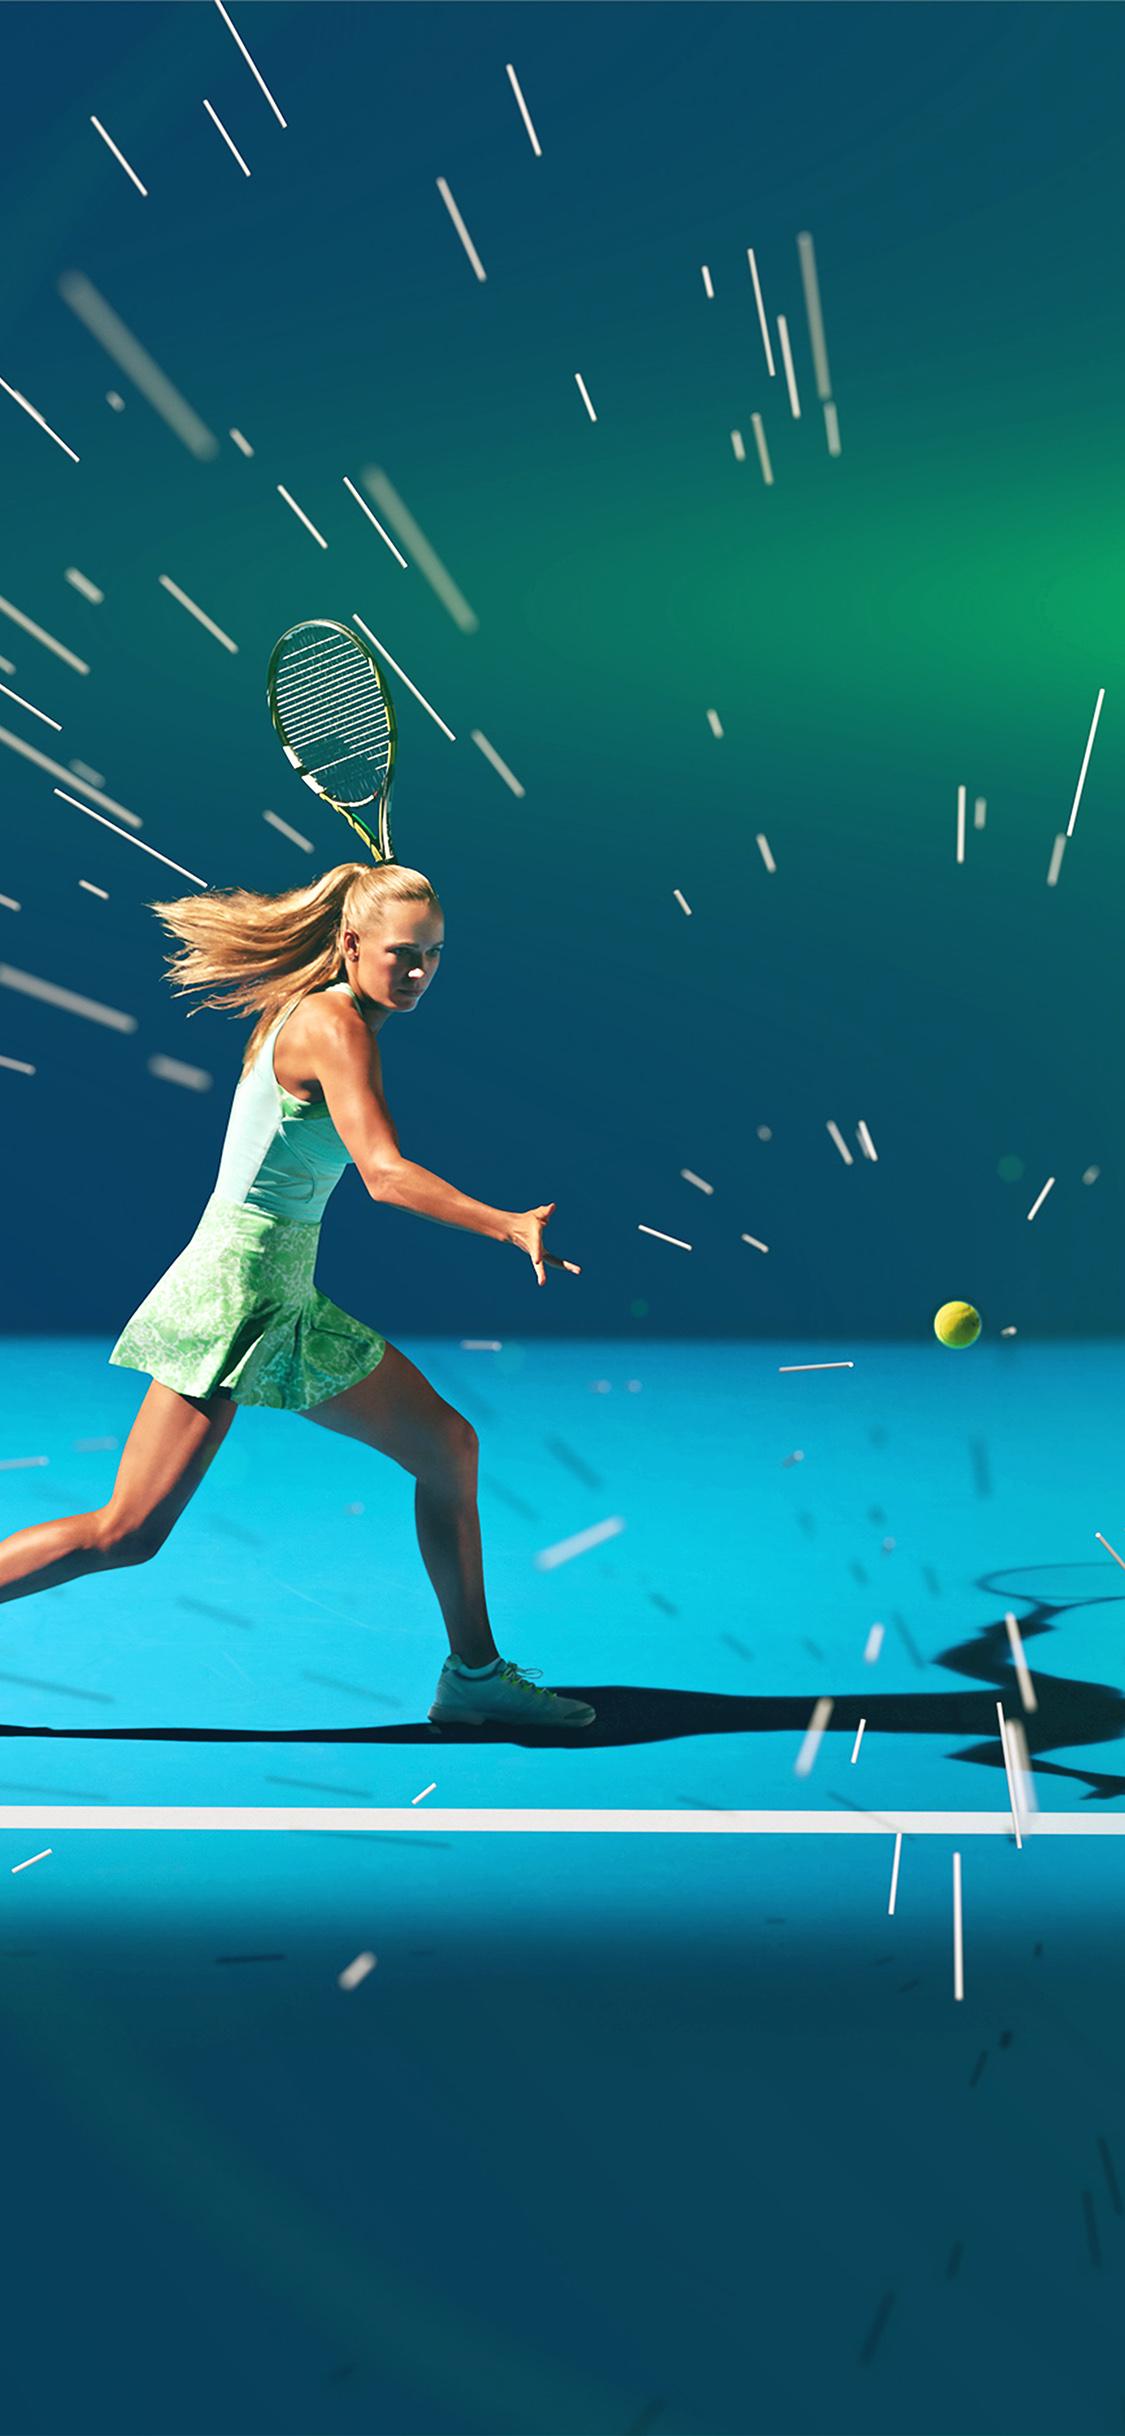 iPhonexpapers.com-Apple-iPhone-wallpaper-ay18-tennis-girl-blue-sports-illustration-art-flare